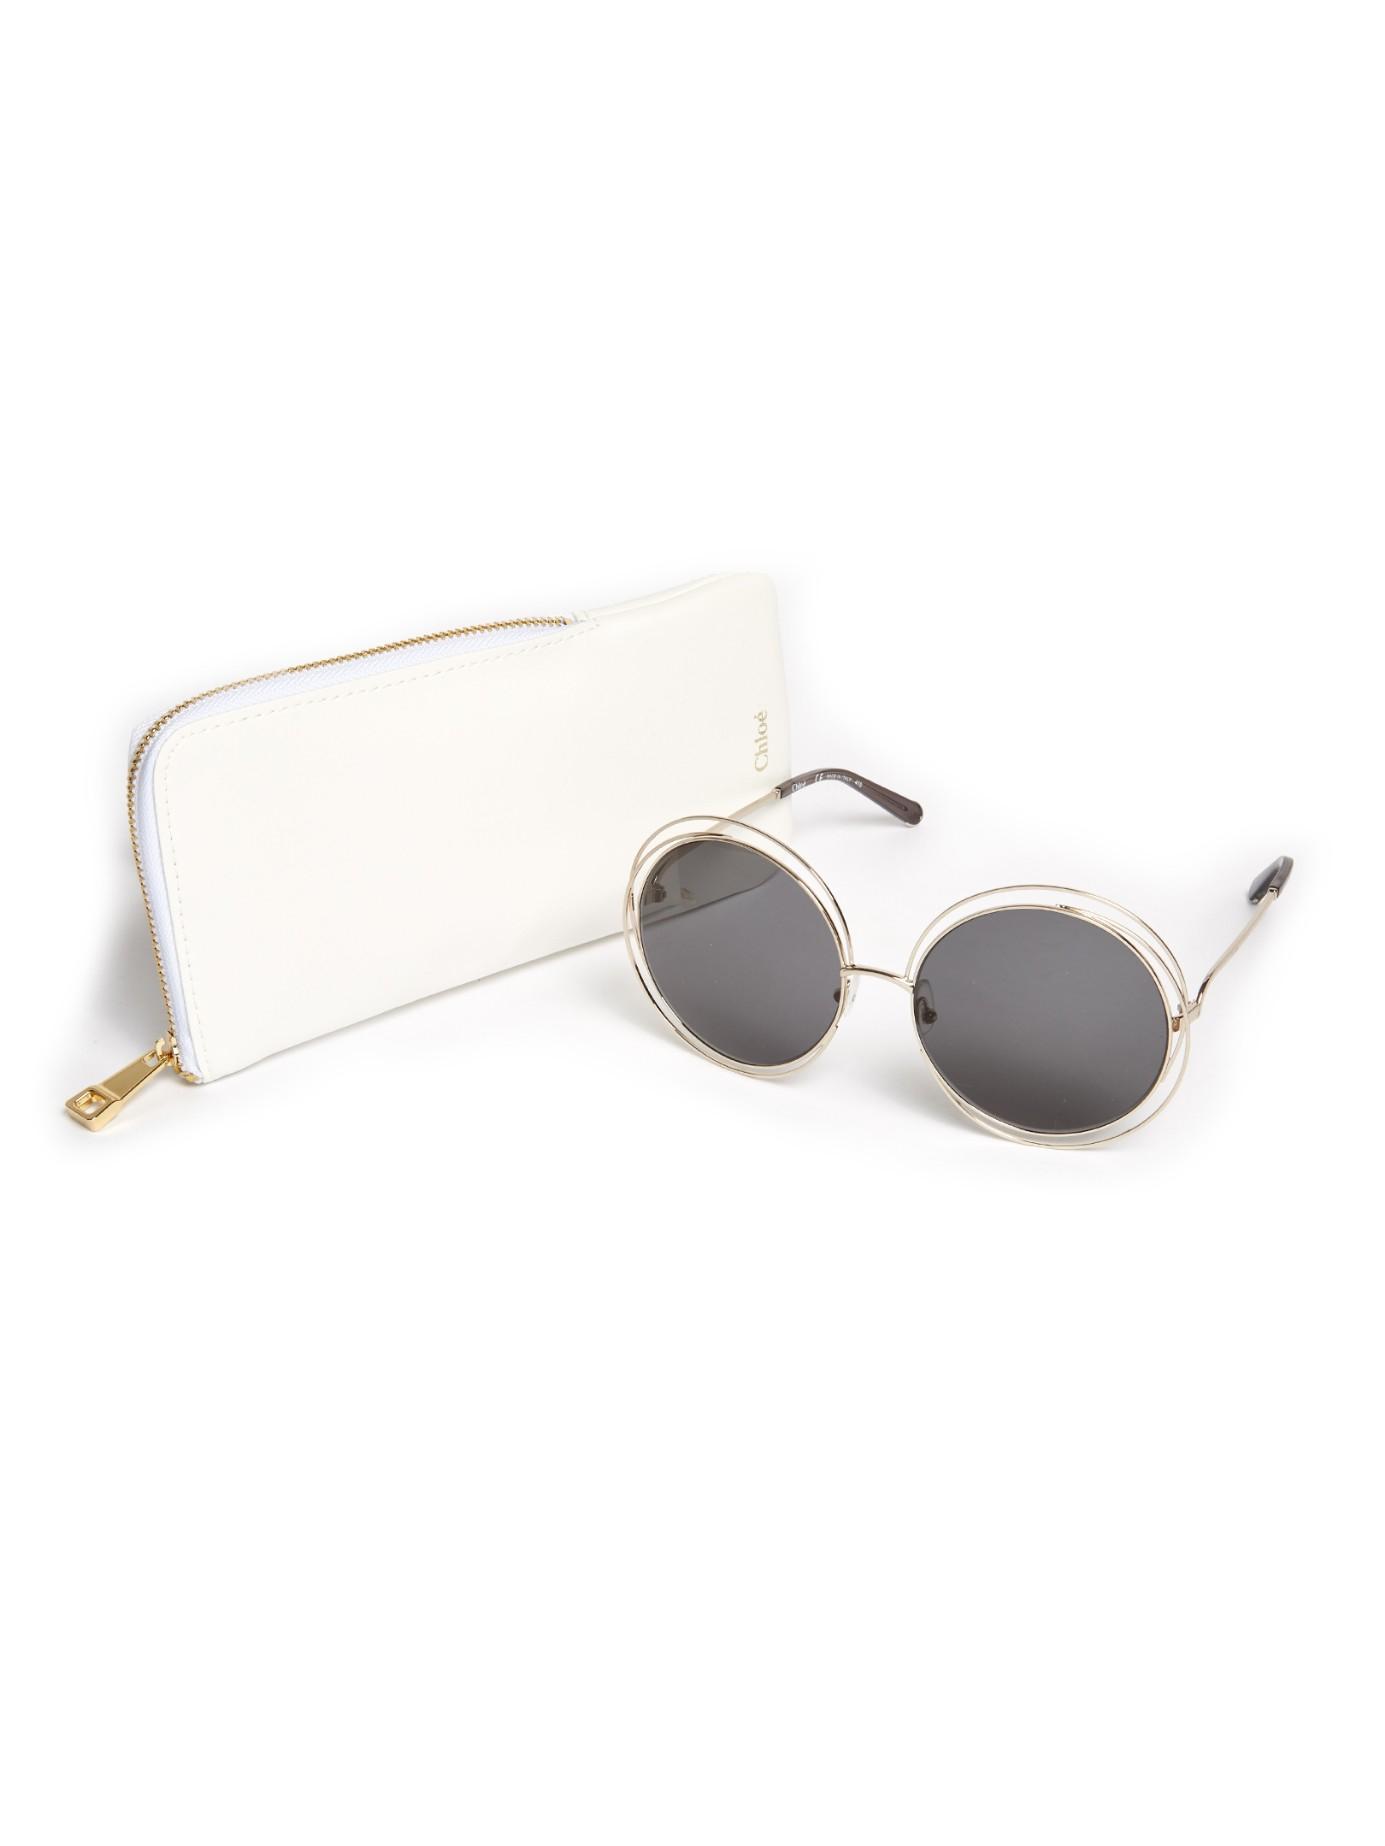 Lyst - Chloé Carlina Round-framed Sunglasses in Metallic